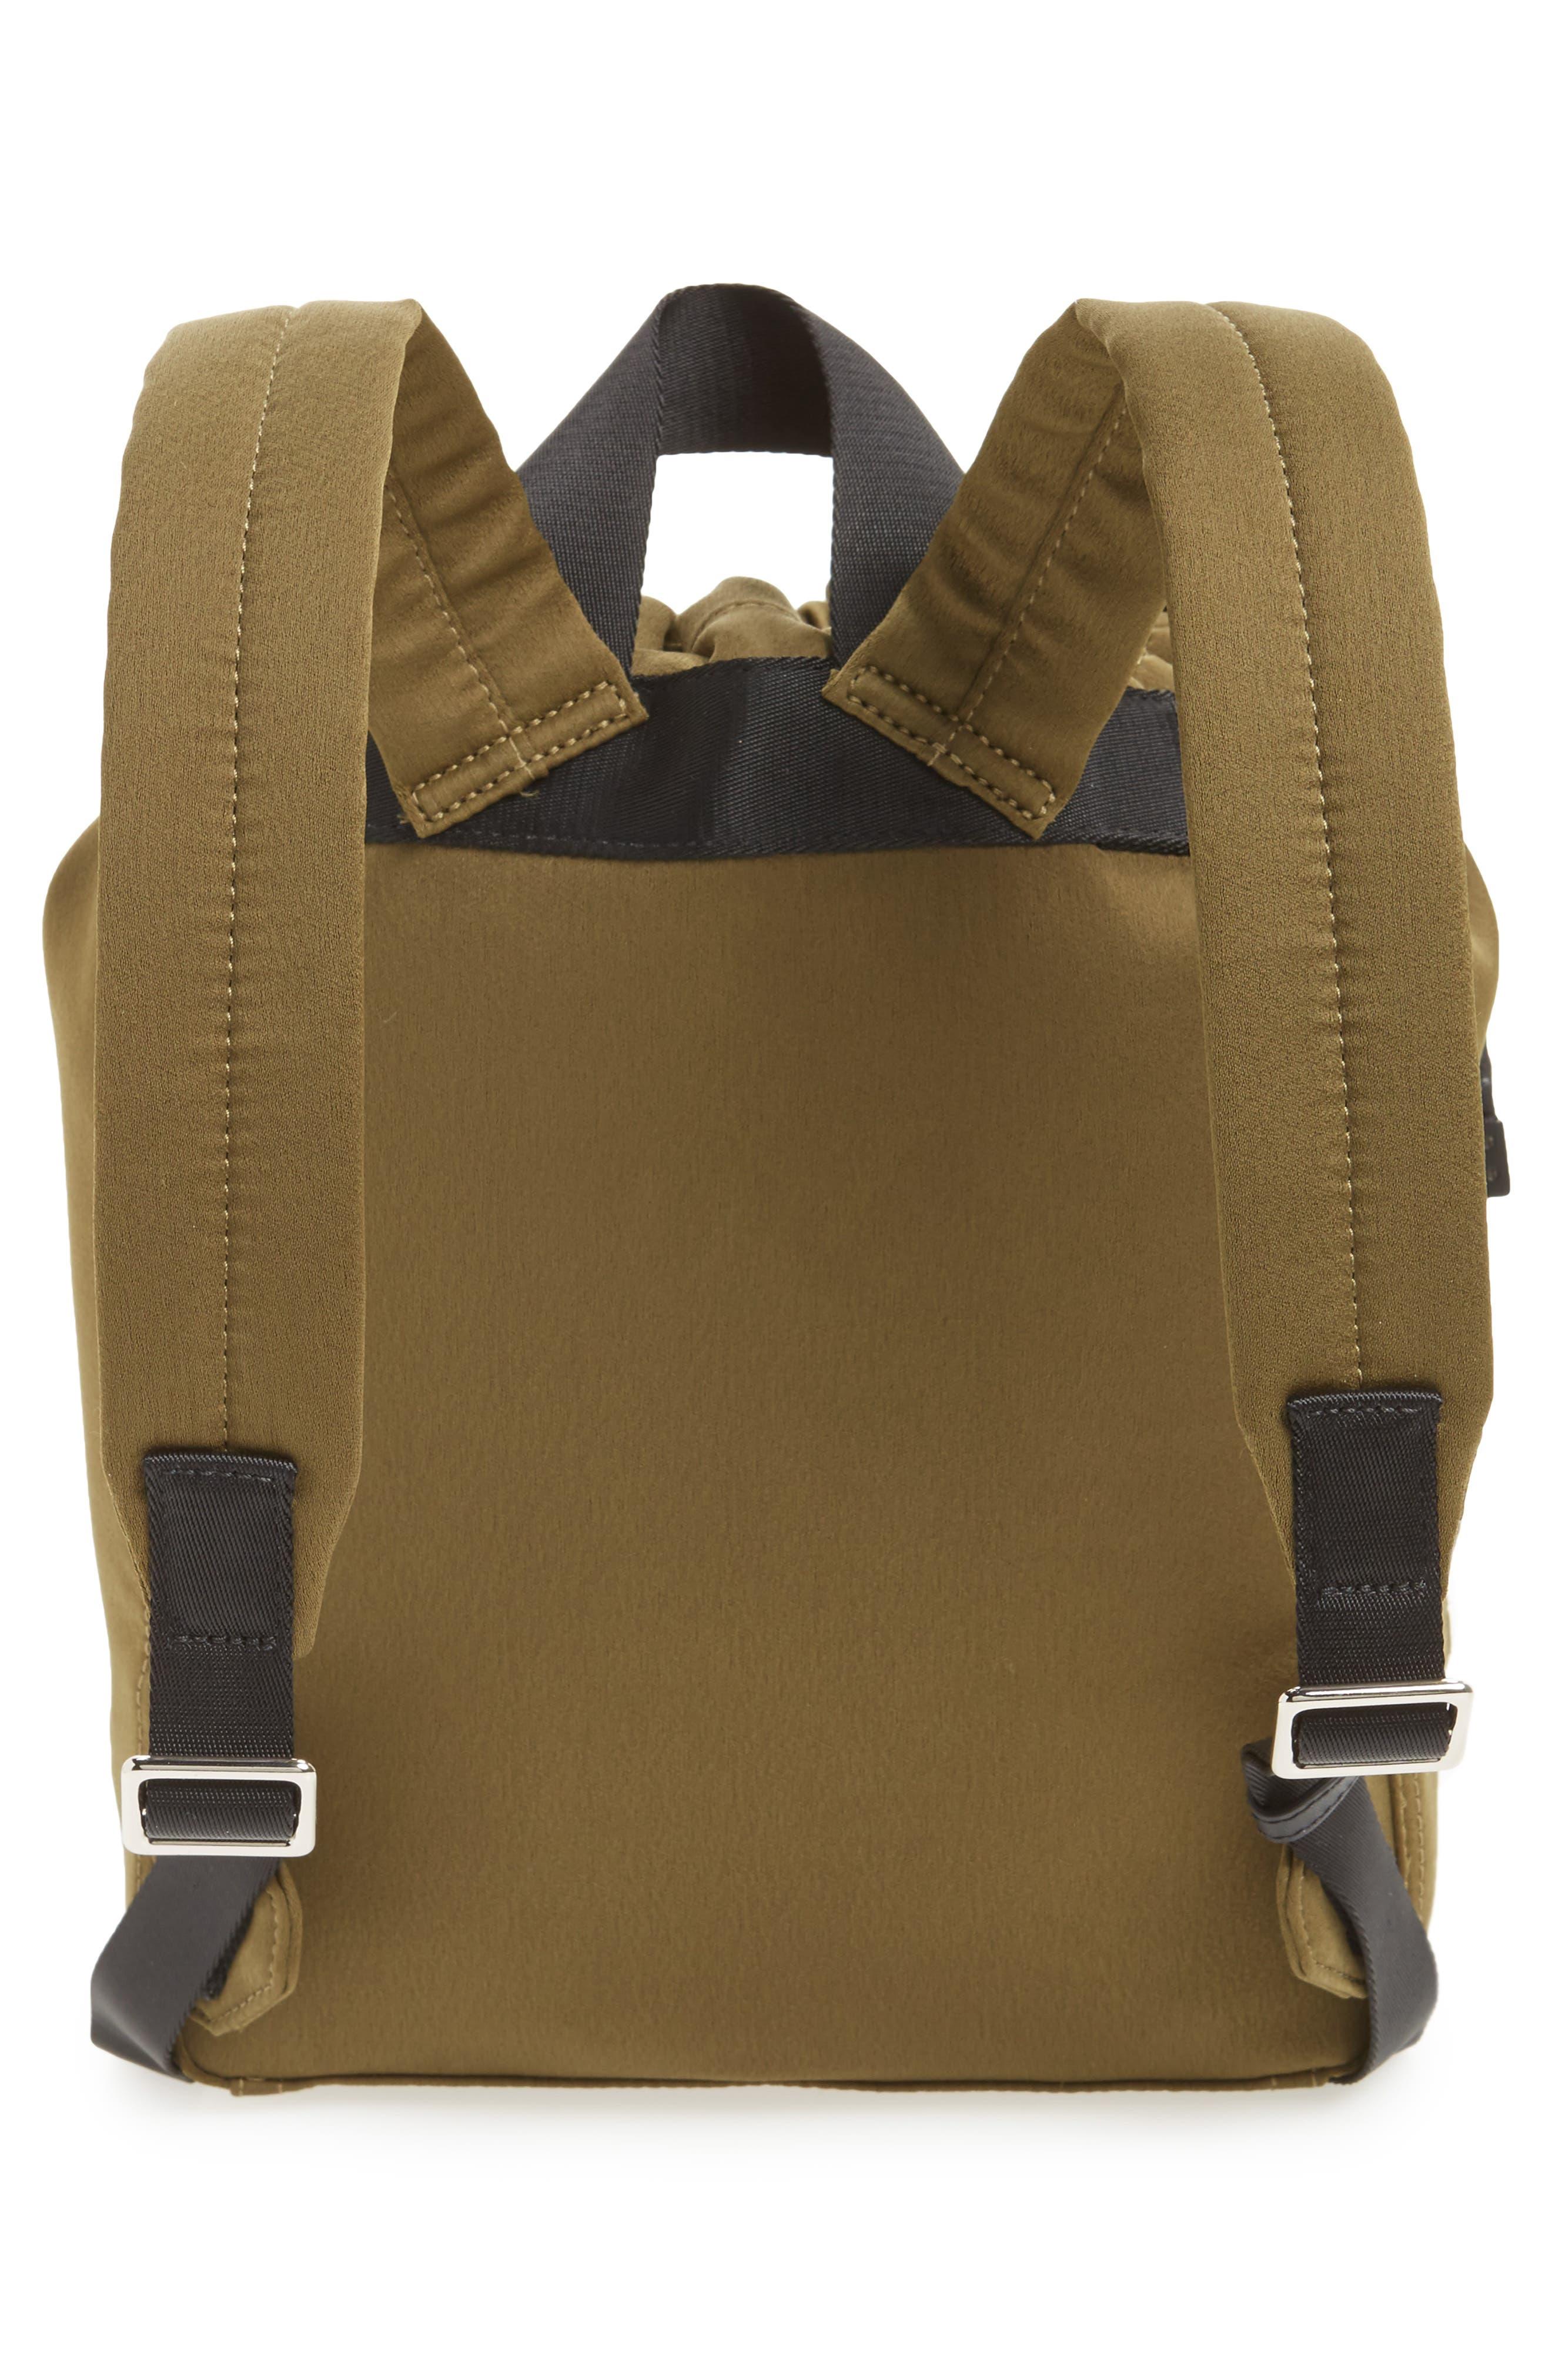 Phillip Lim 3.1 Medium Go-Go Embellished Backpack,                             Alternate thumbnail 3, color,                             301